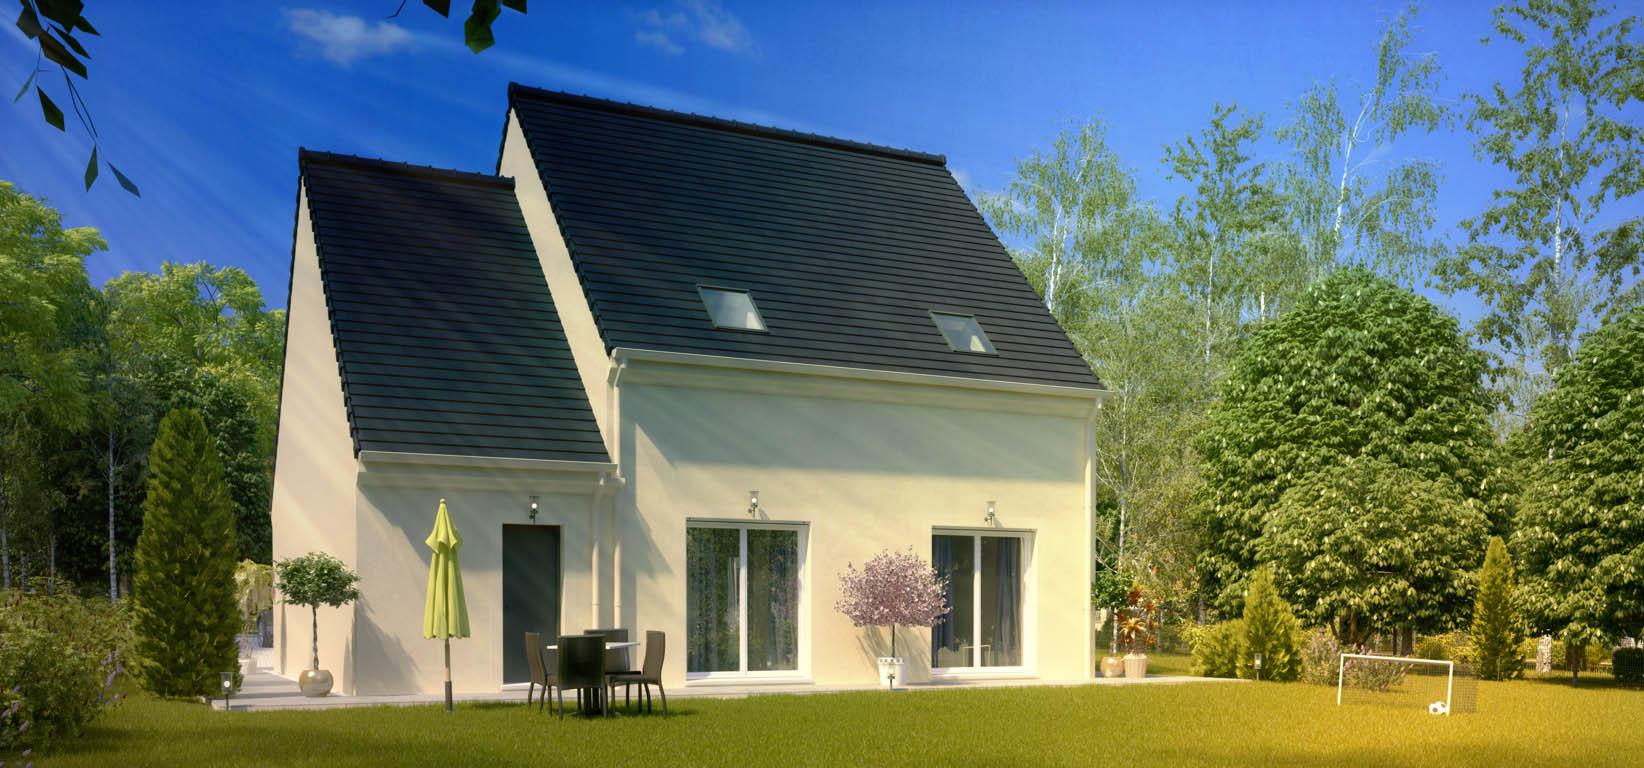 Huis for Garage morigny champigny